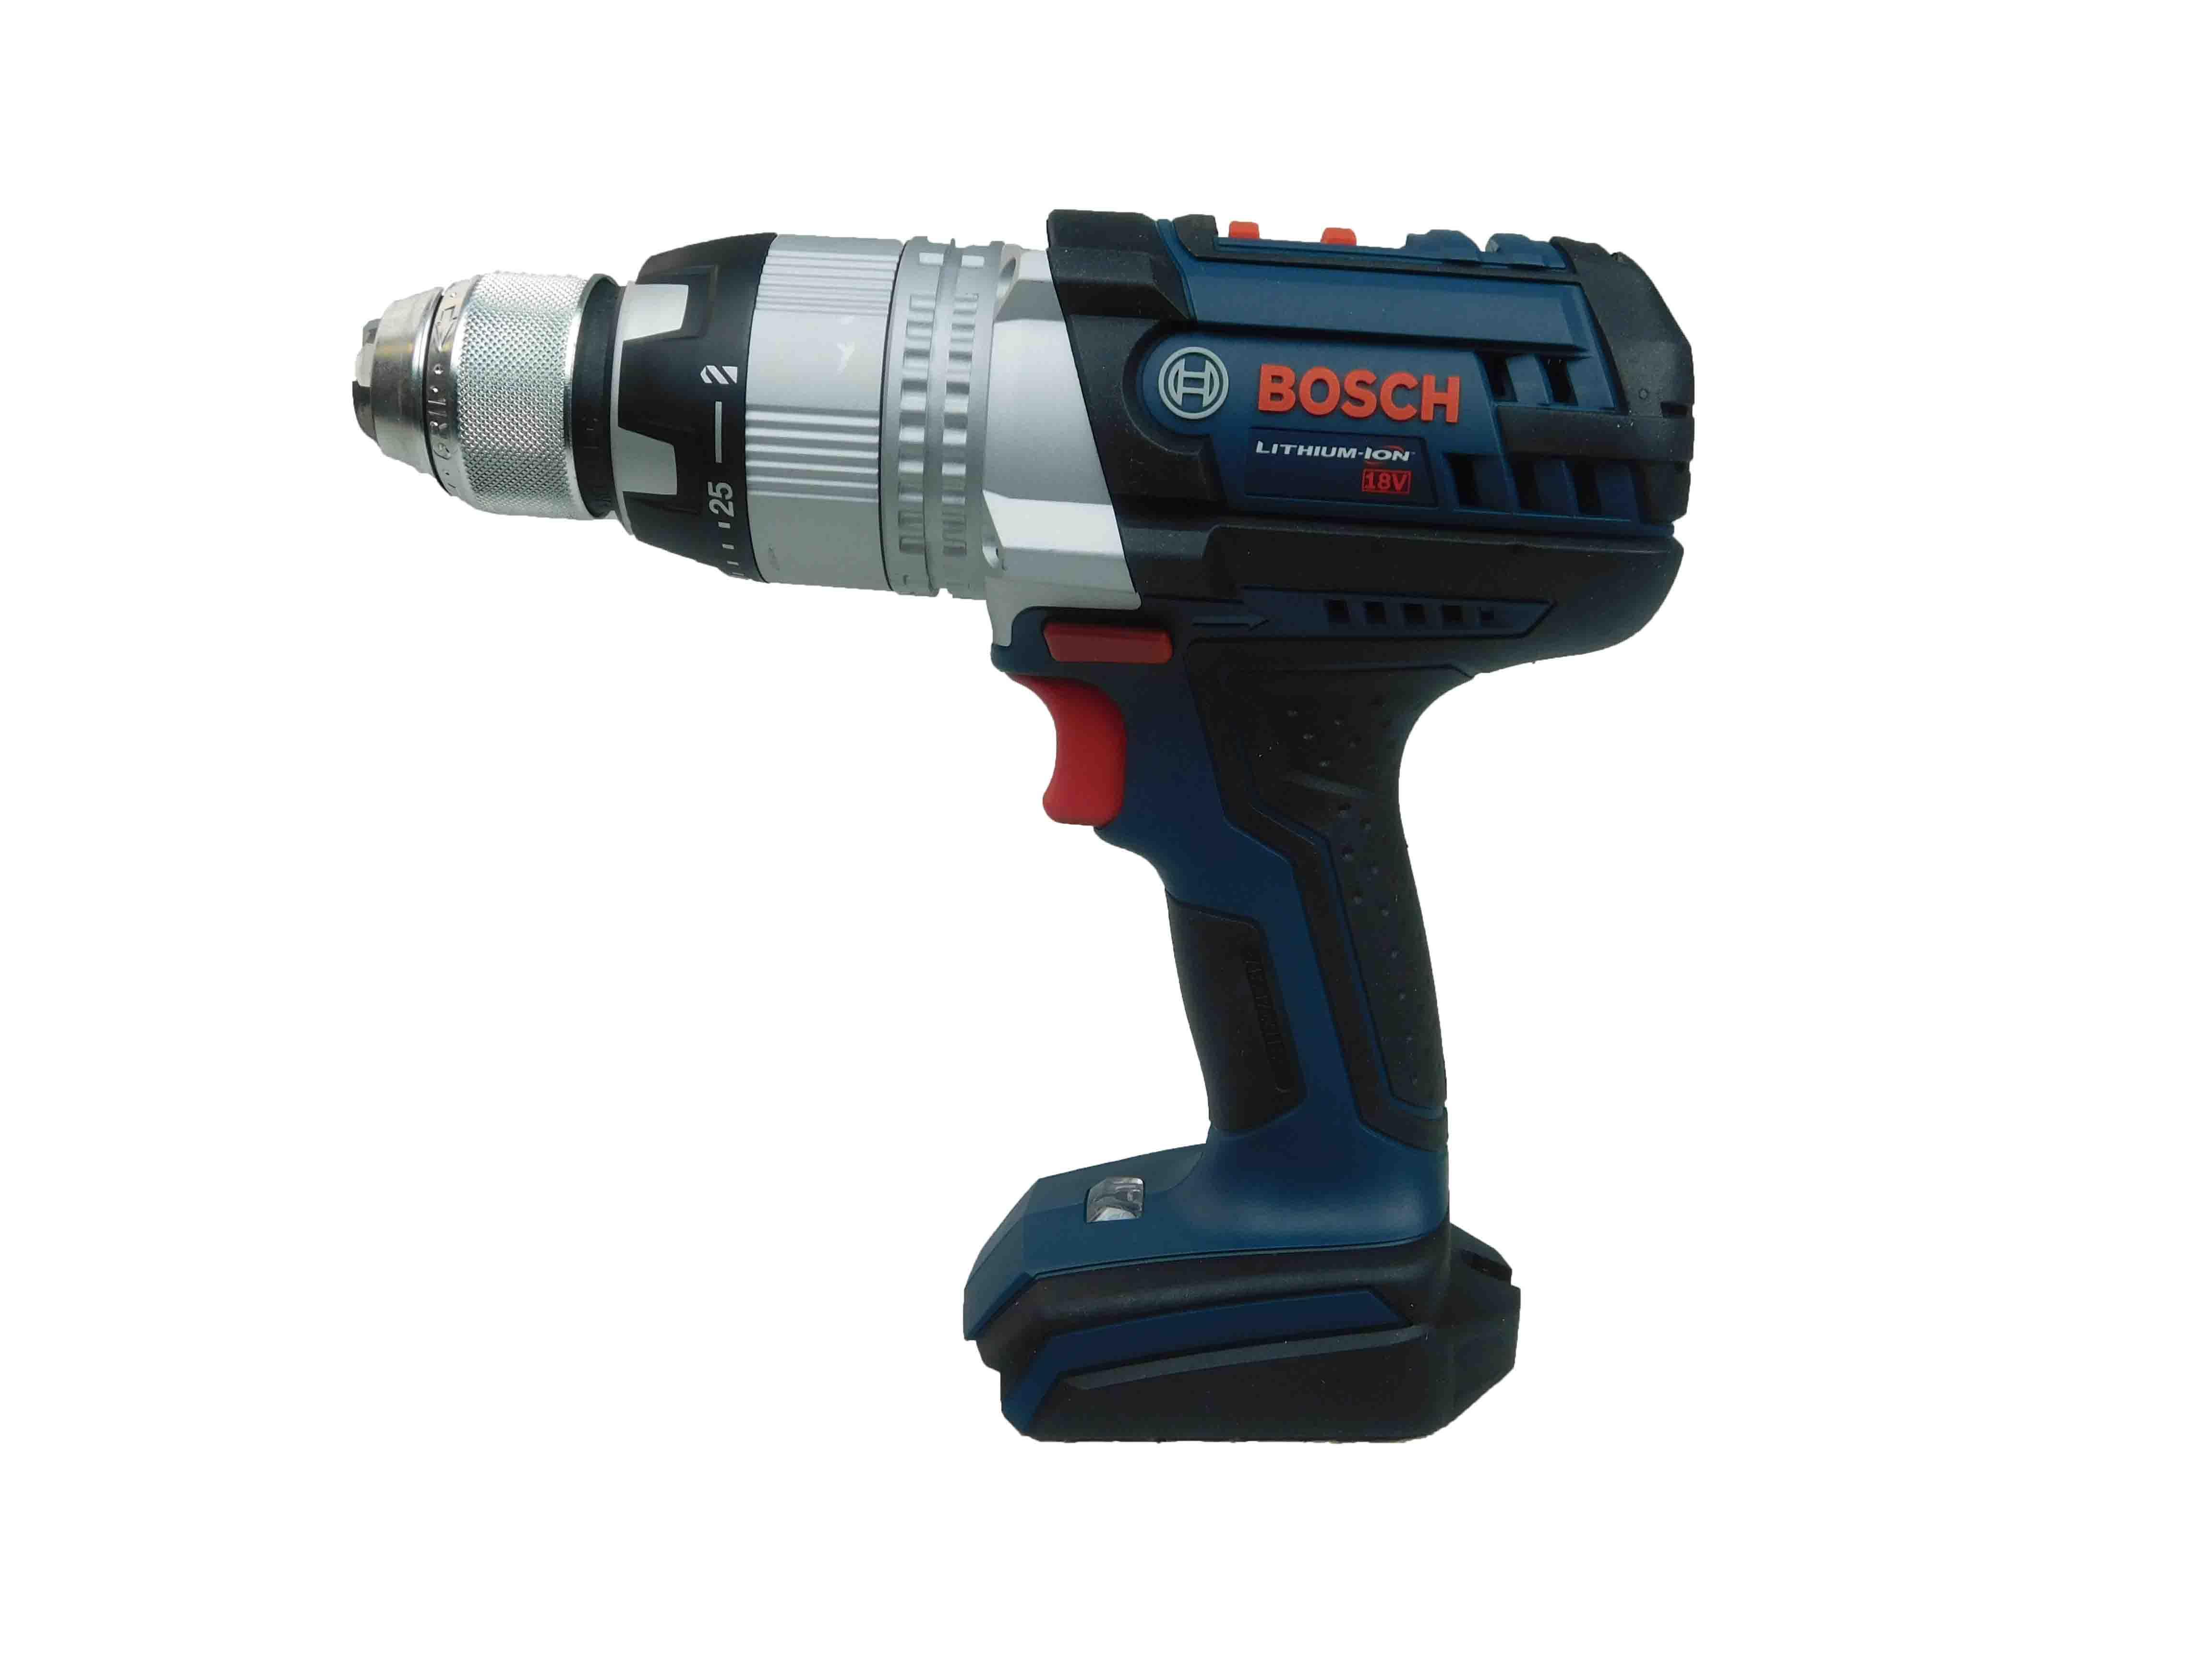 Bosch-HDH181XB18V-Brute-Tough-1-2-In.-Hammer-Drill-Driver-image-12